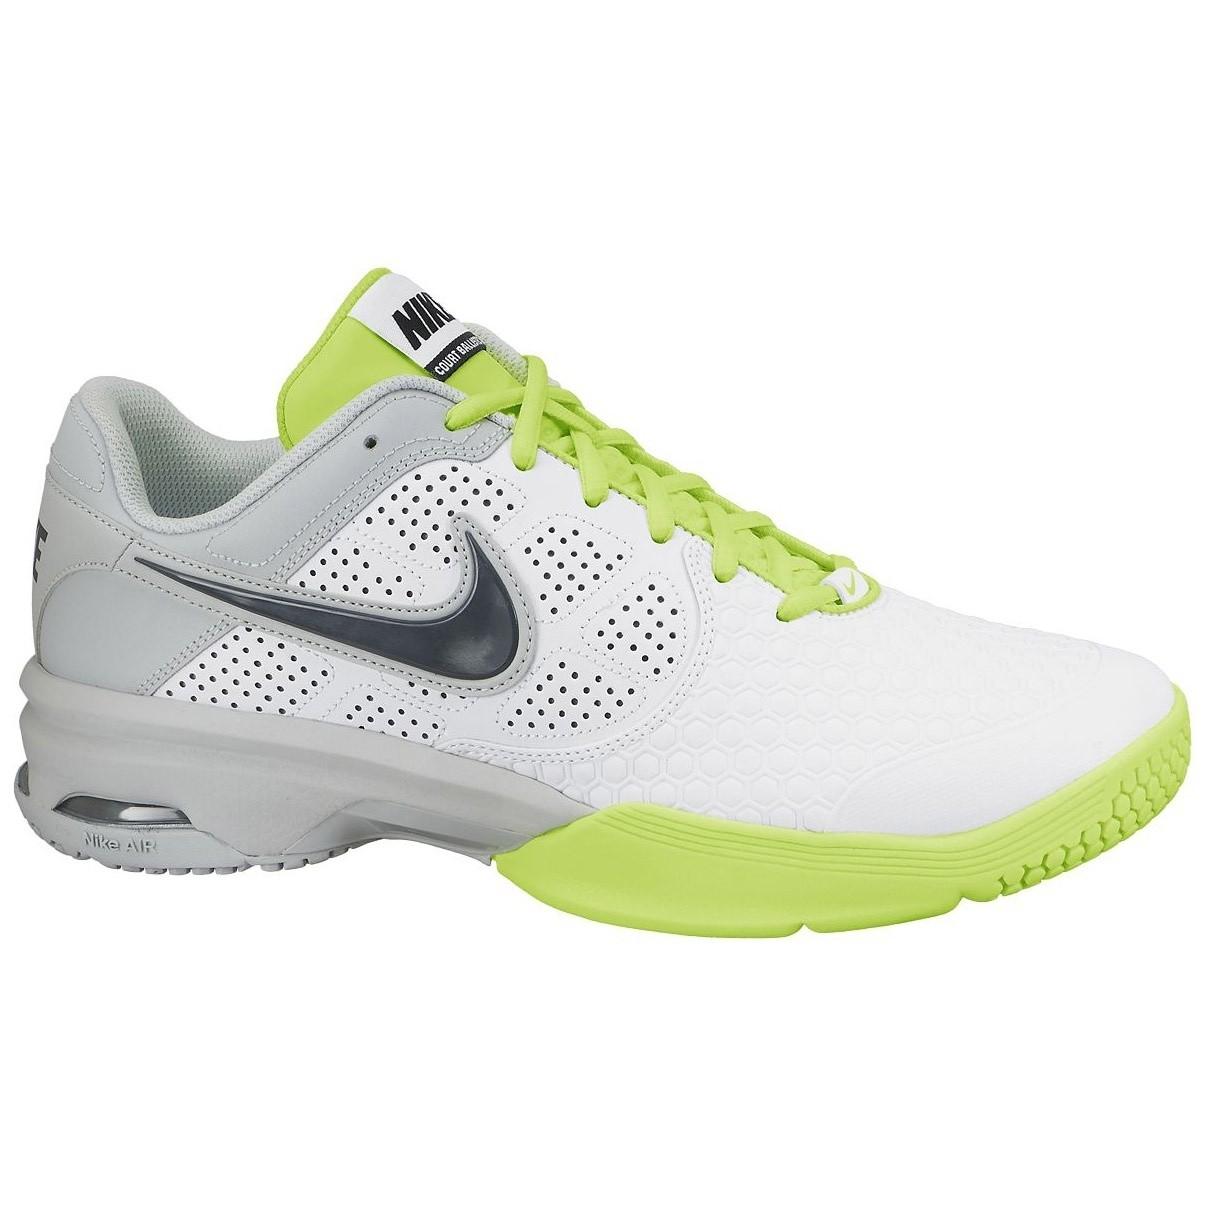 SNEAKERS di Nike Tg. de 40.5 NERO Uomo 488144a - duradrusti.org ff103b5d57b